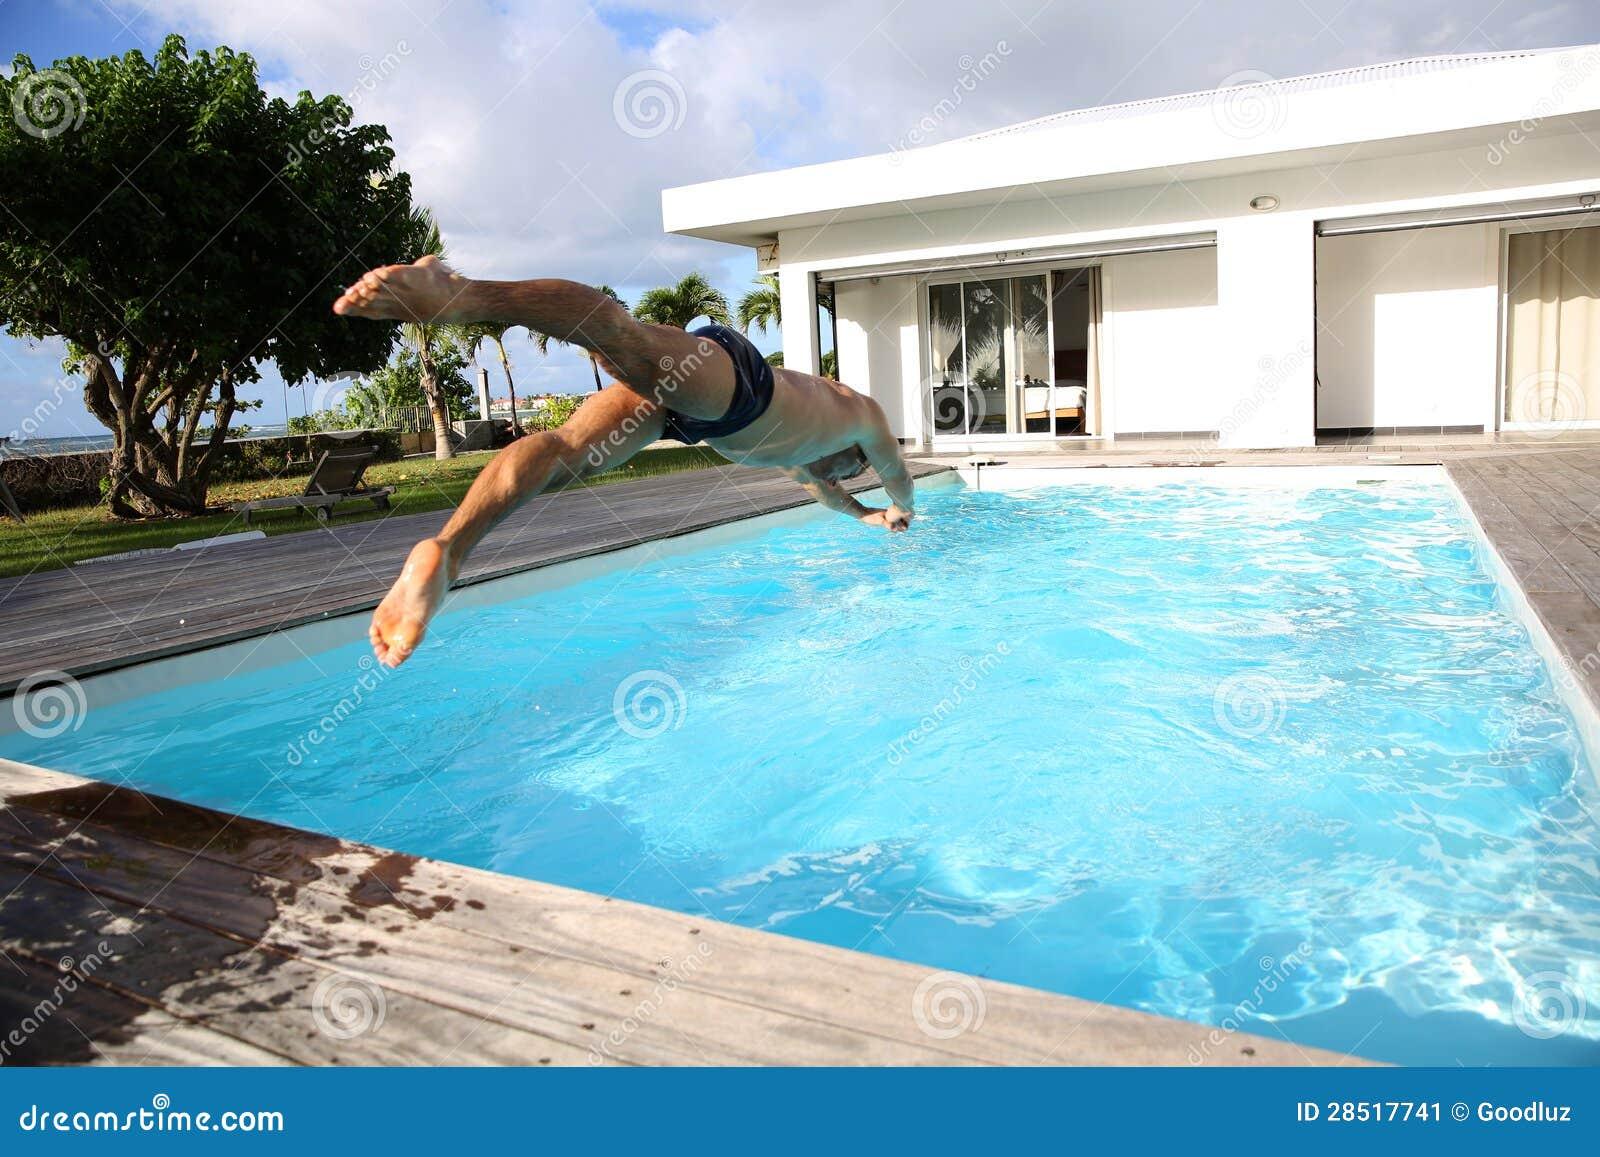 Mergulho do homem na piscina imagem de stock imagem 28517741 - Business plan piscina ...